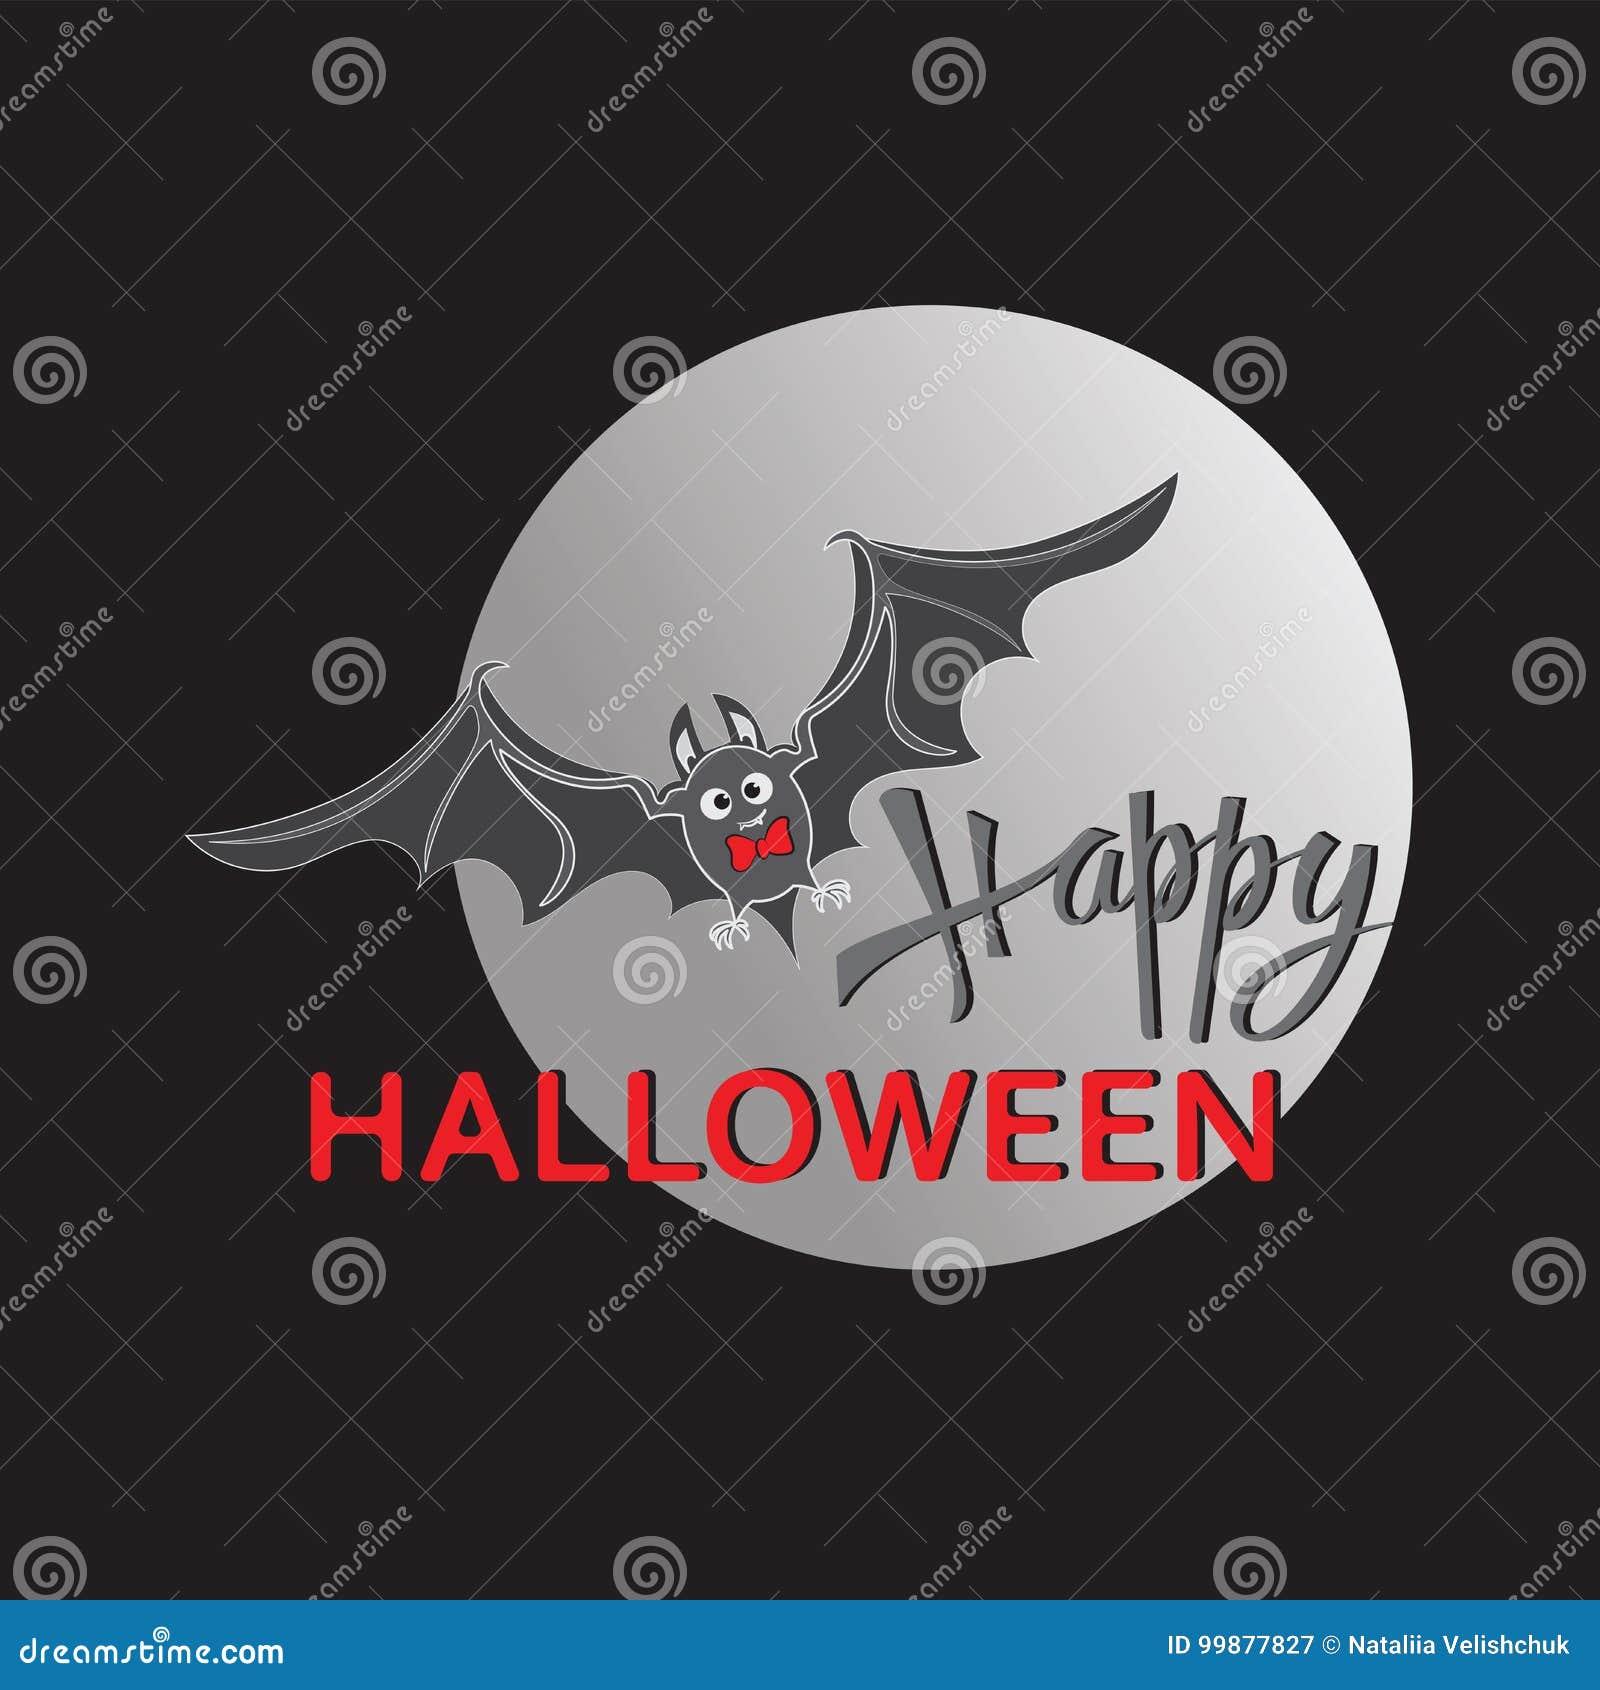 happy halloween design of the message stock vector illustration